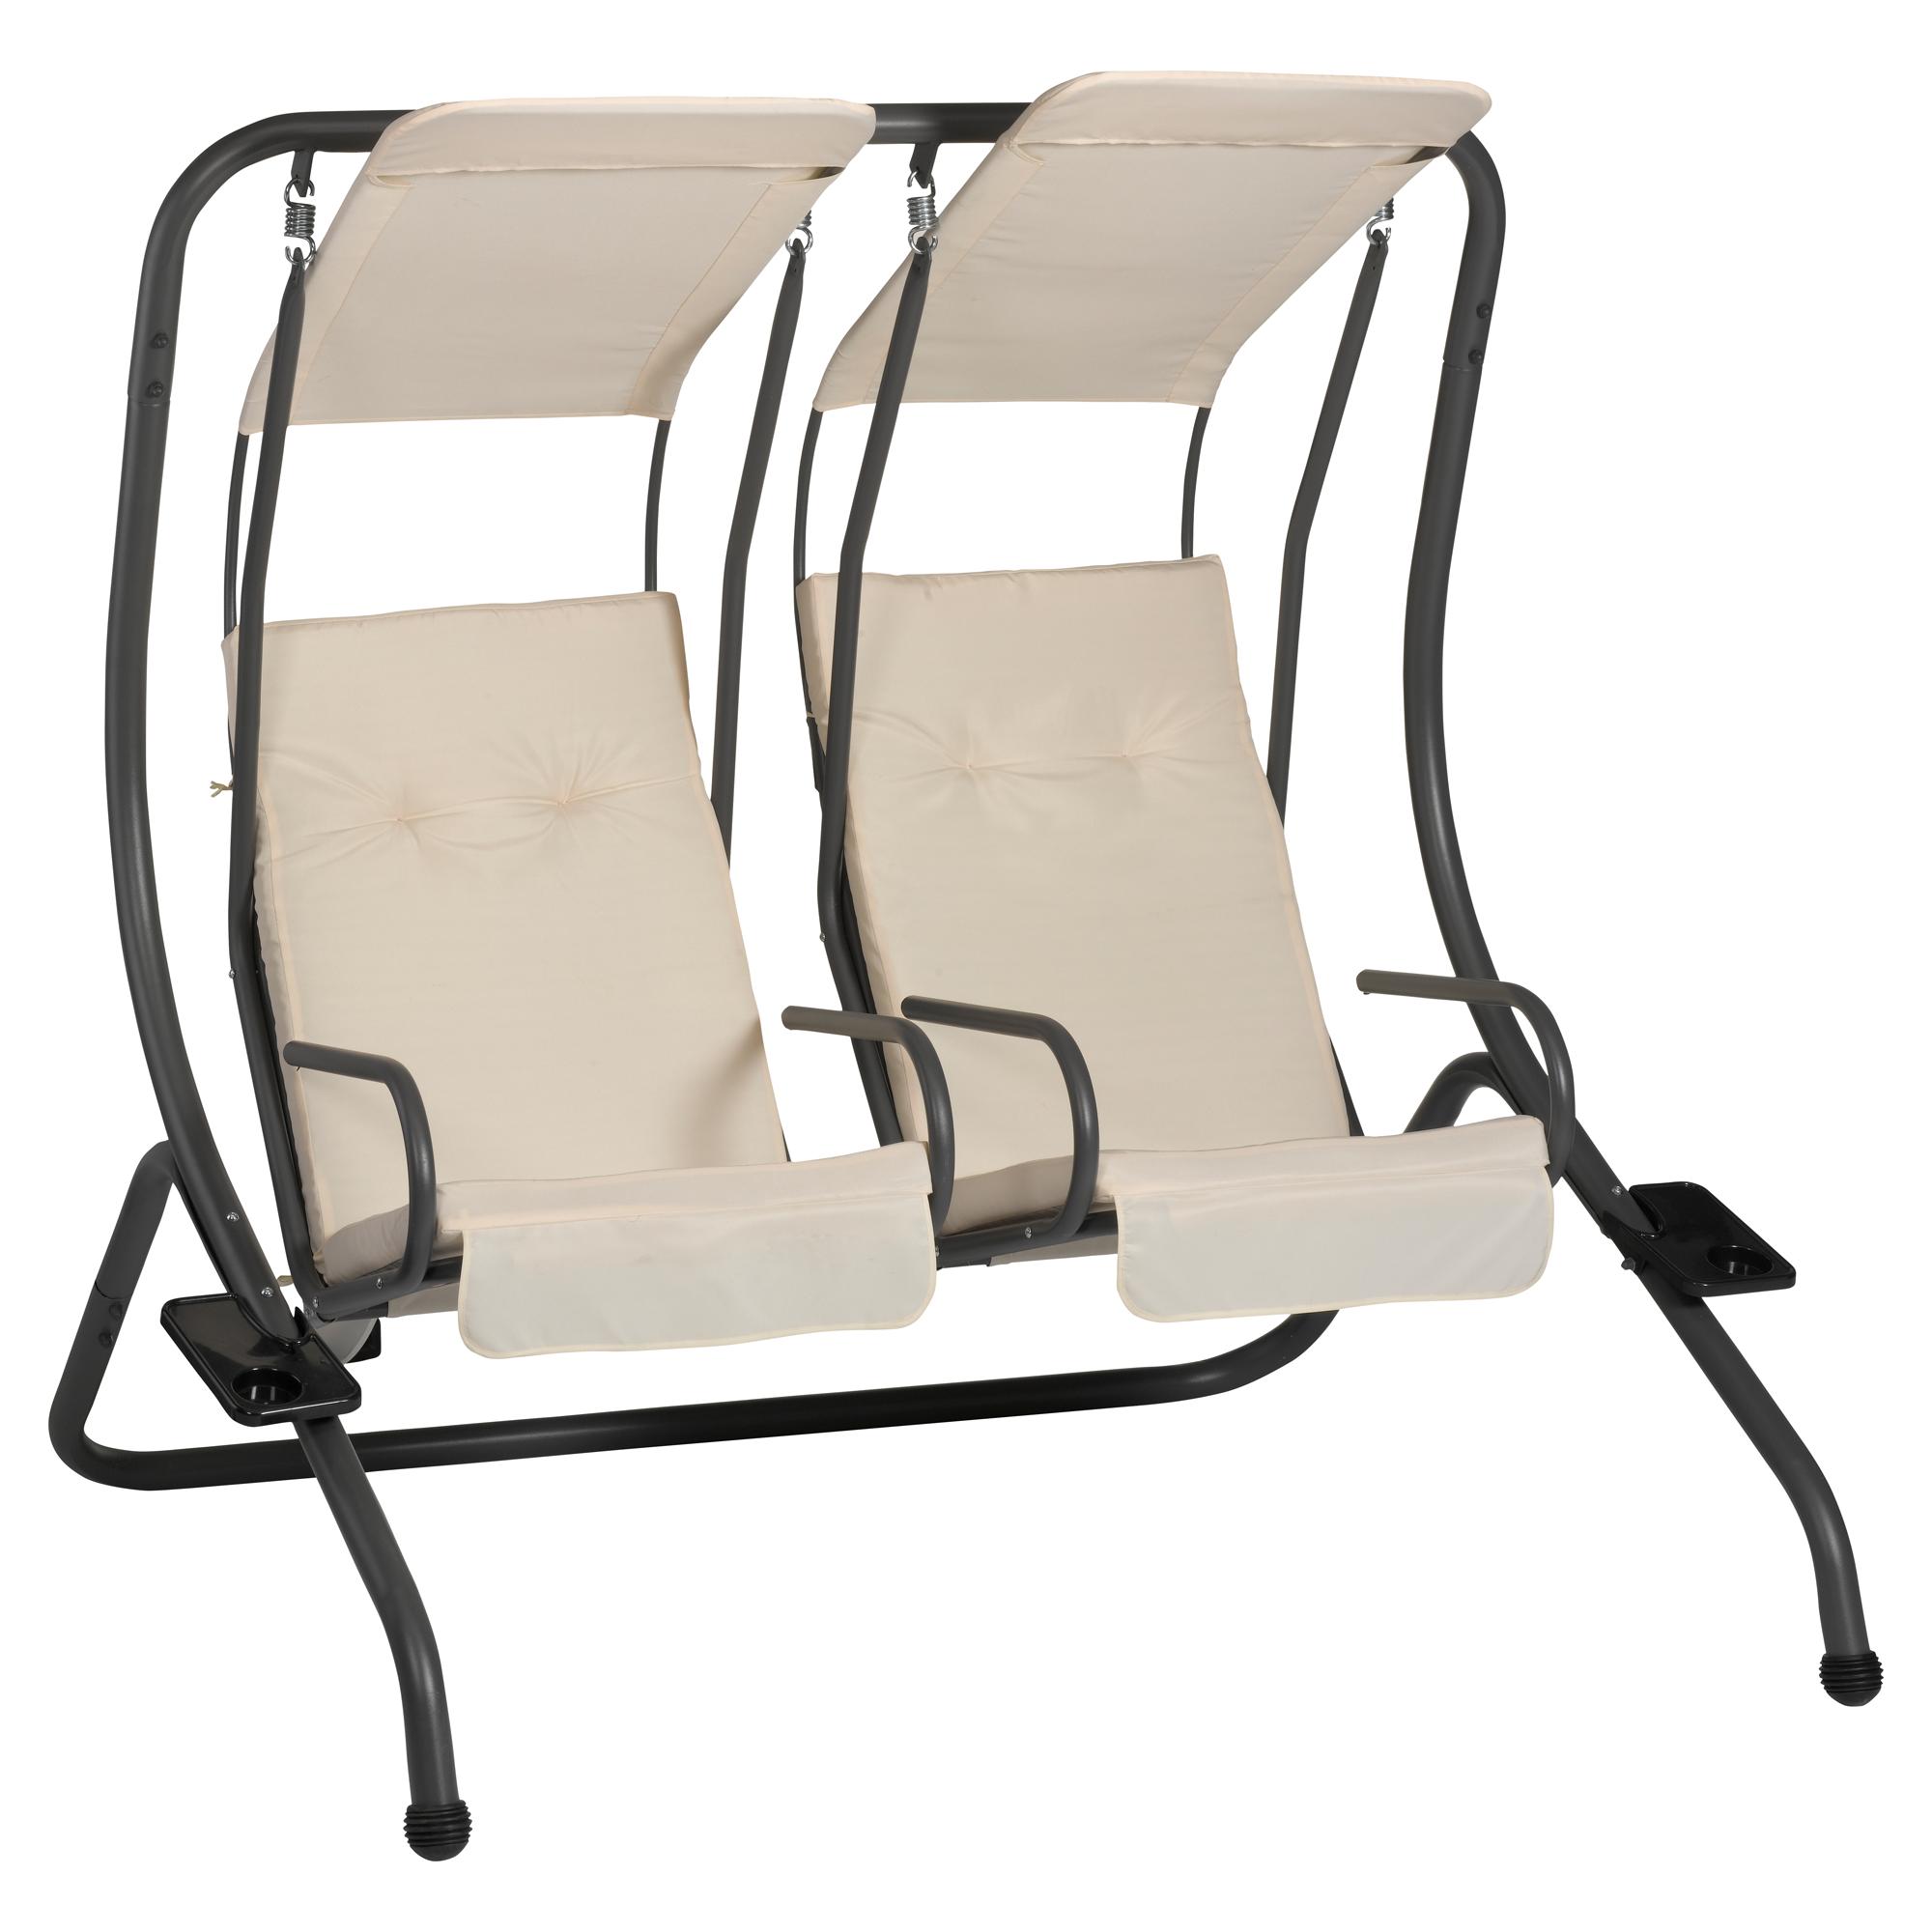 hollywoodschaukel twin 2 sitzer schwarz beige toom baumarkt. Black Bedroom Furniture Sets. Home Design Ideas